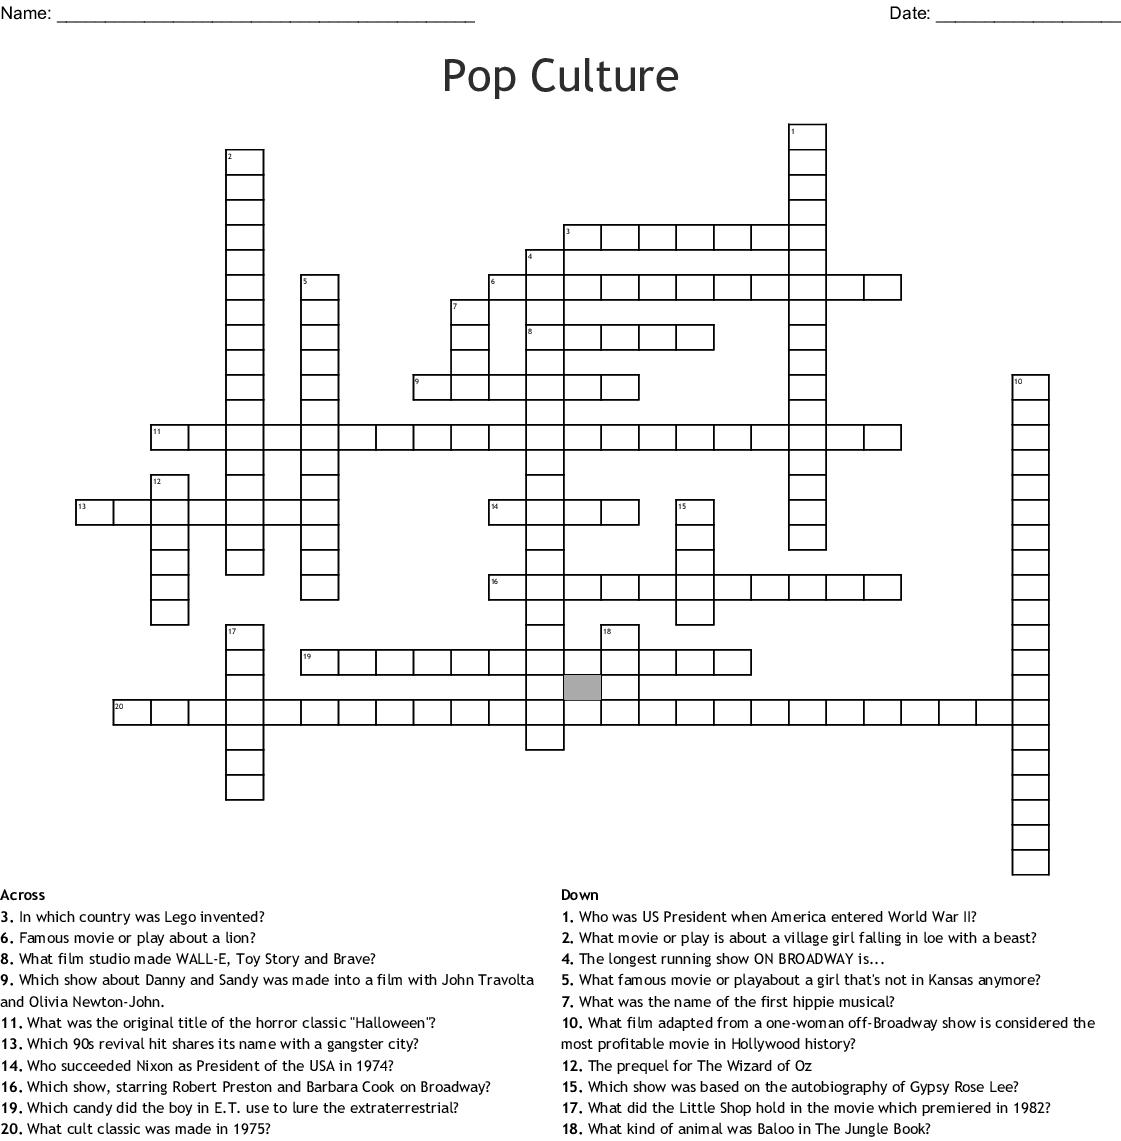 Pop Culture Crossword Puzzles Printable